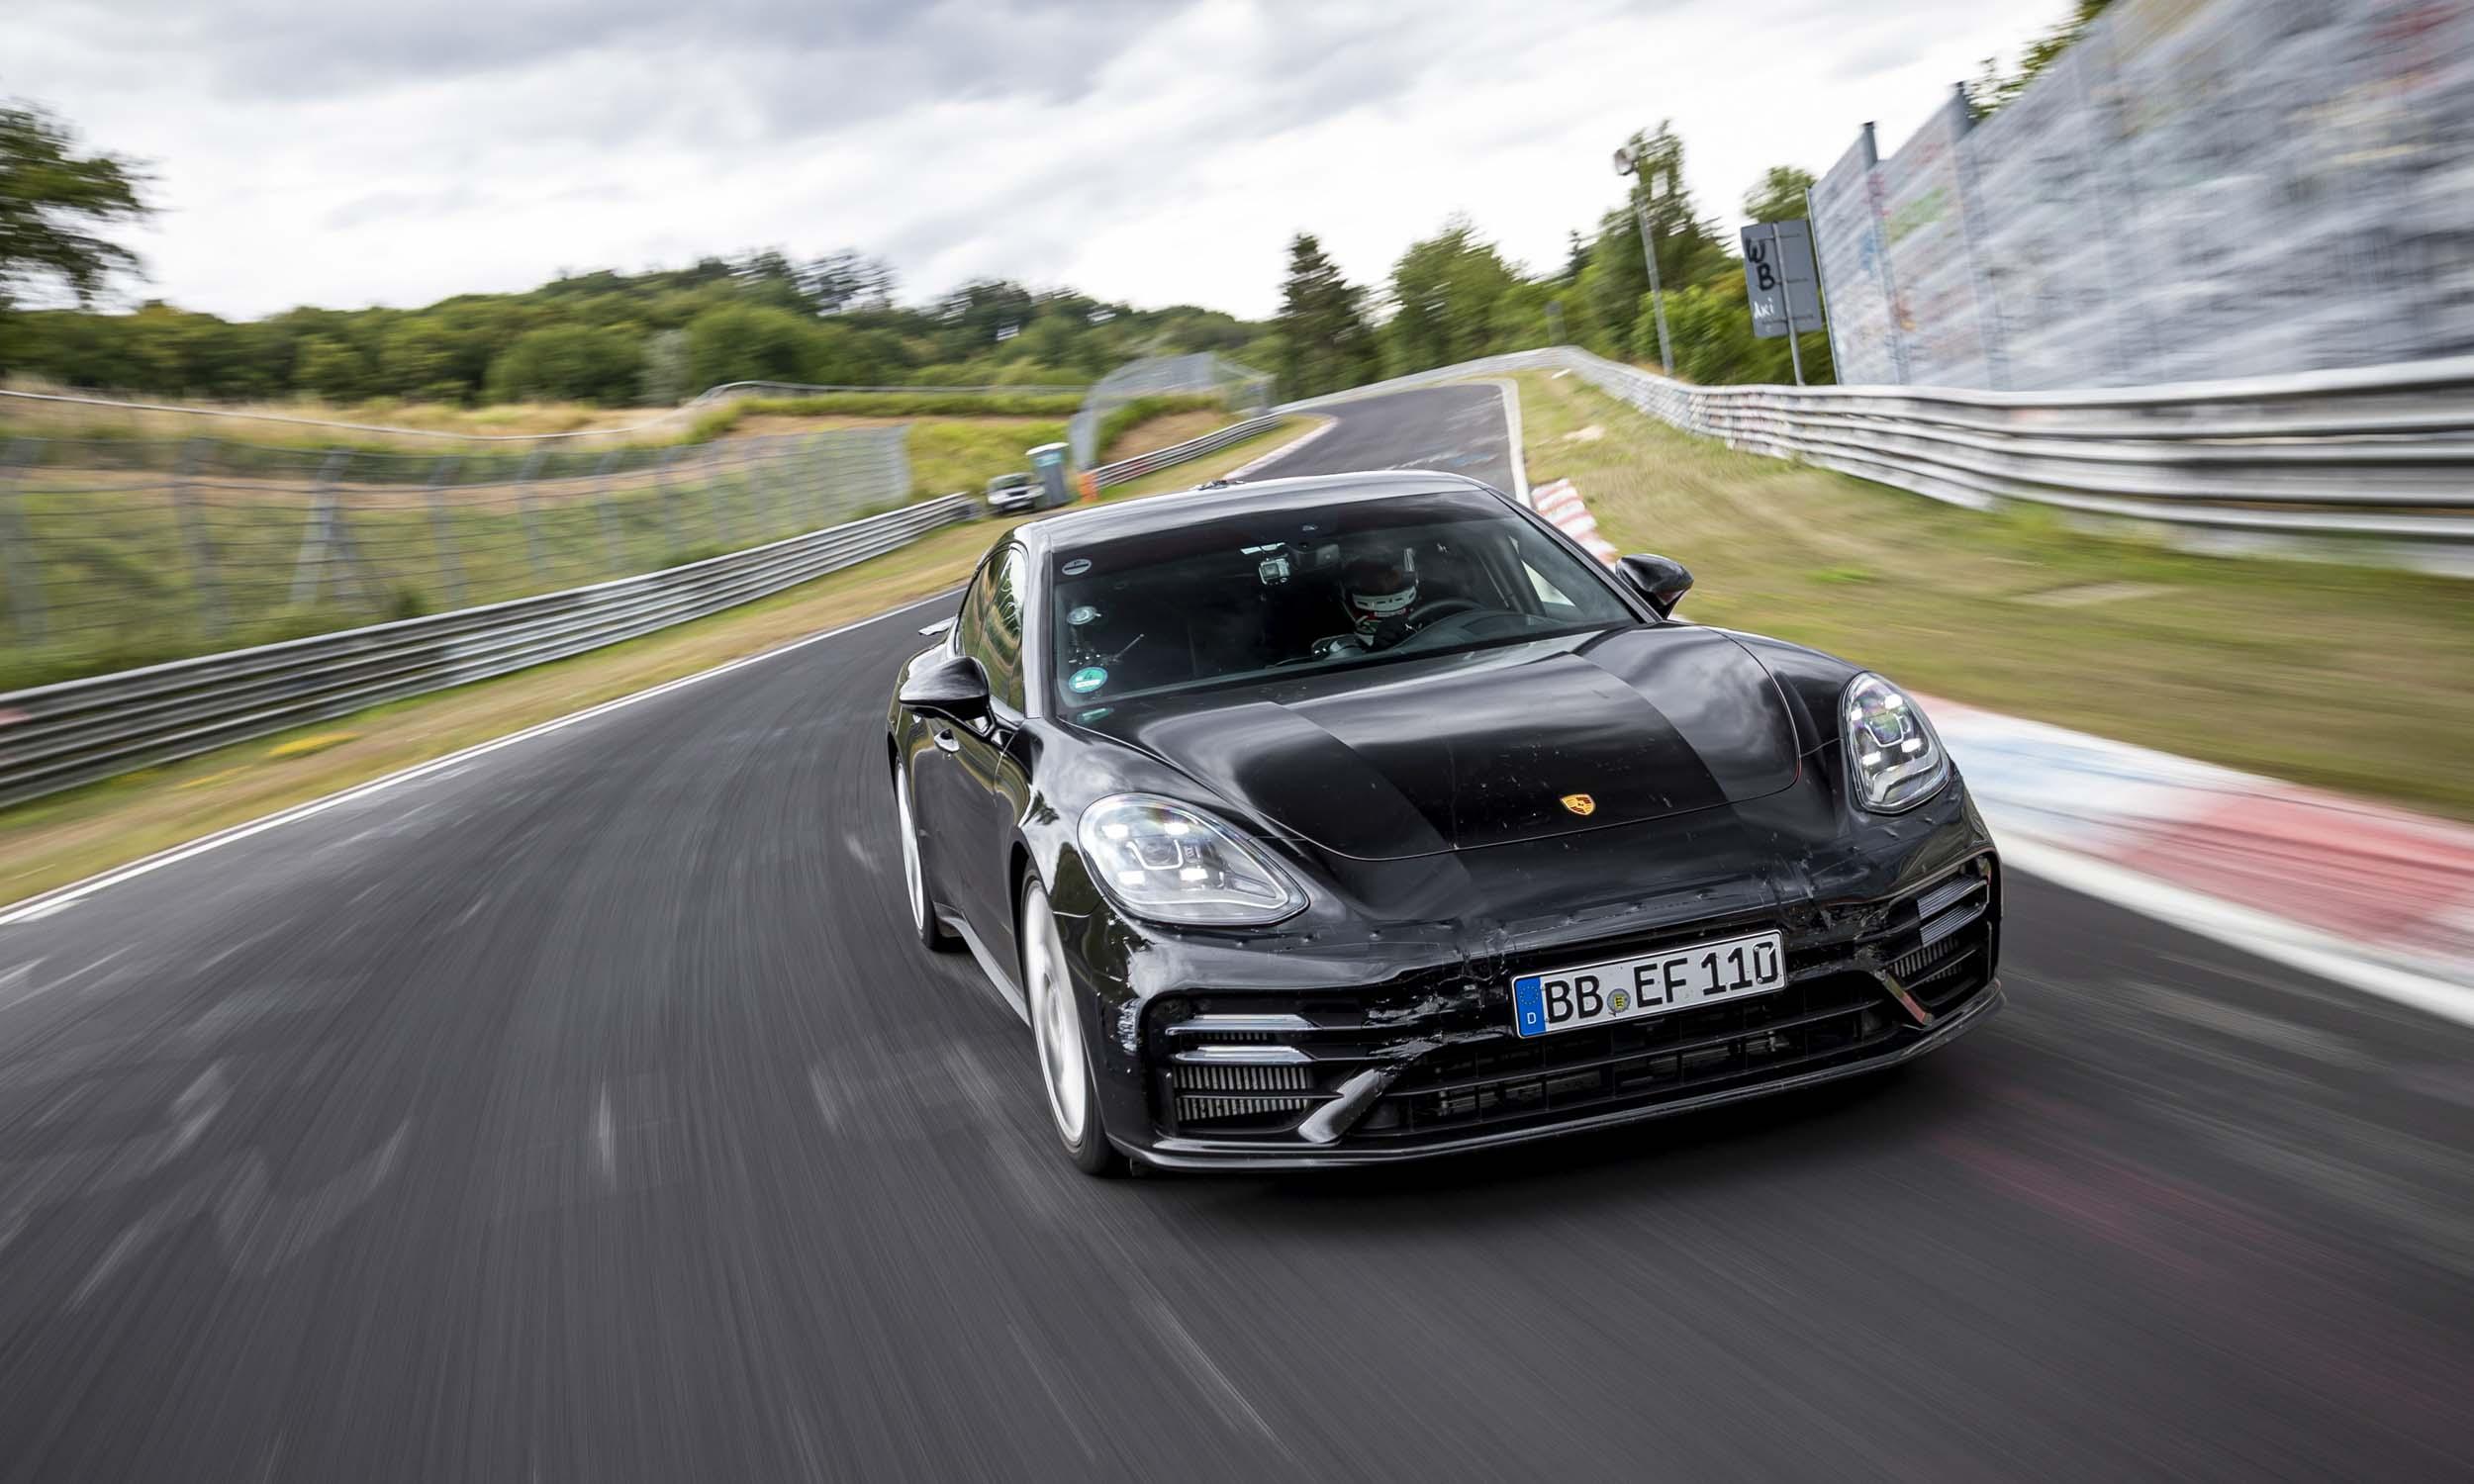 2021 Porsche Panamera Sets Record at Nurburgringnbsp